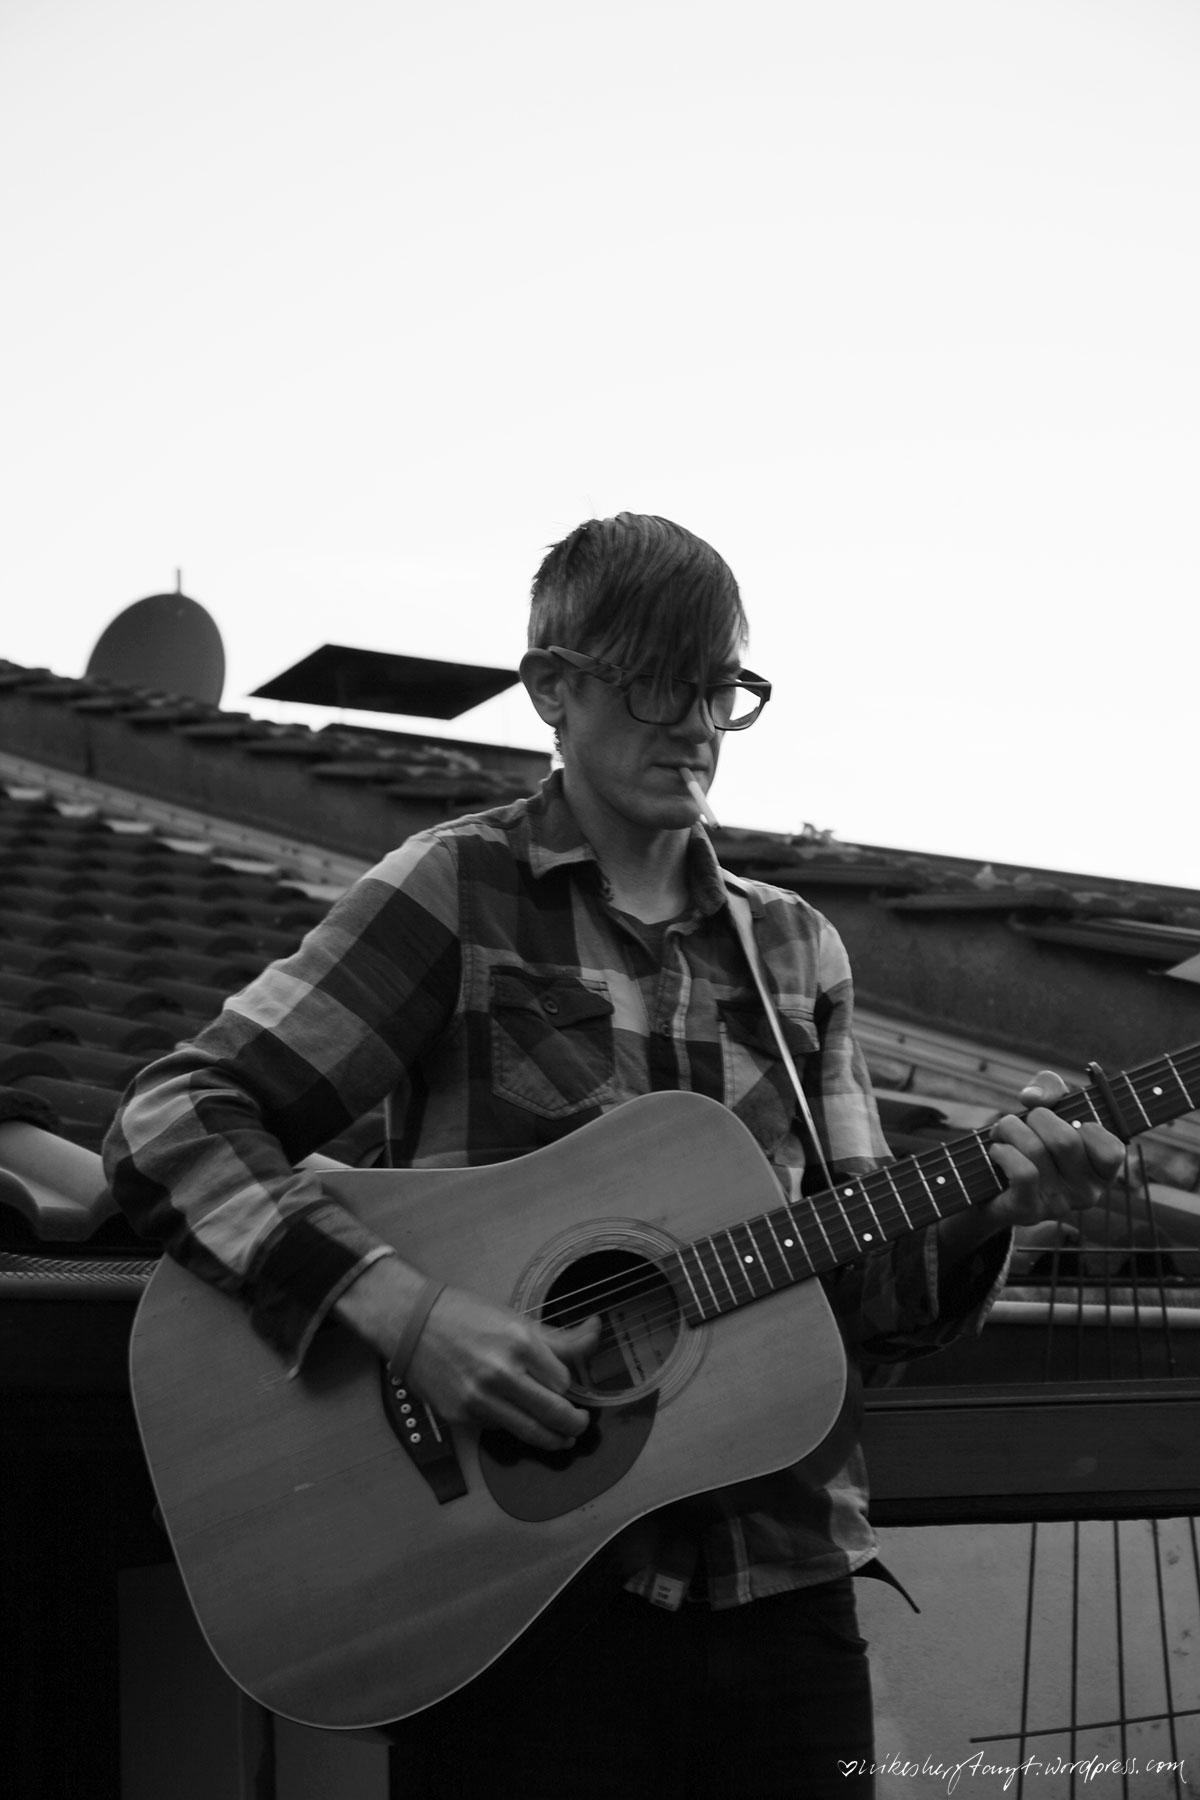 über den dächern, houseshow, konzert, musik ist ein grundnahrungsmittel, ghost of a chance, krist krueger, dachterrasse, gitarren, good time, flix records, nikesherztanzt